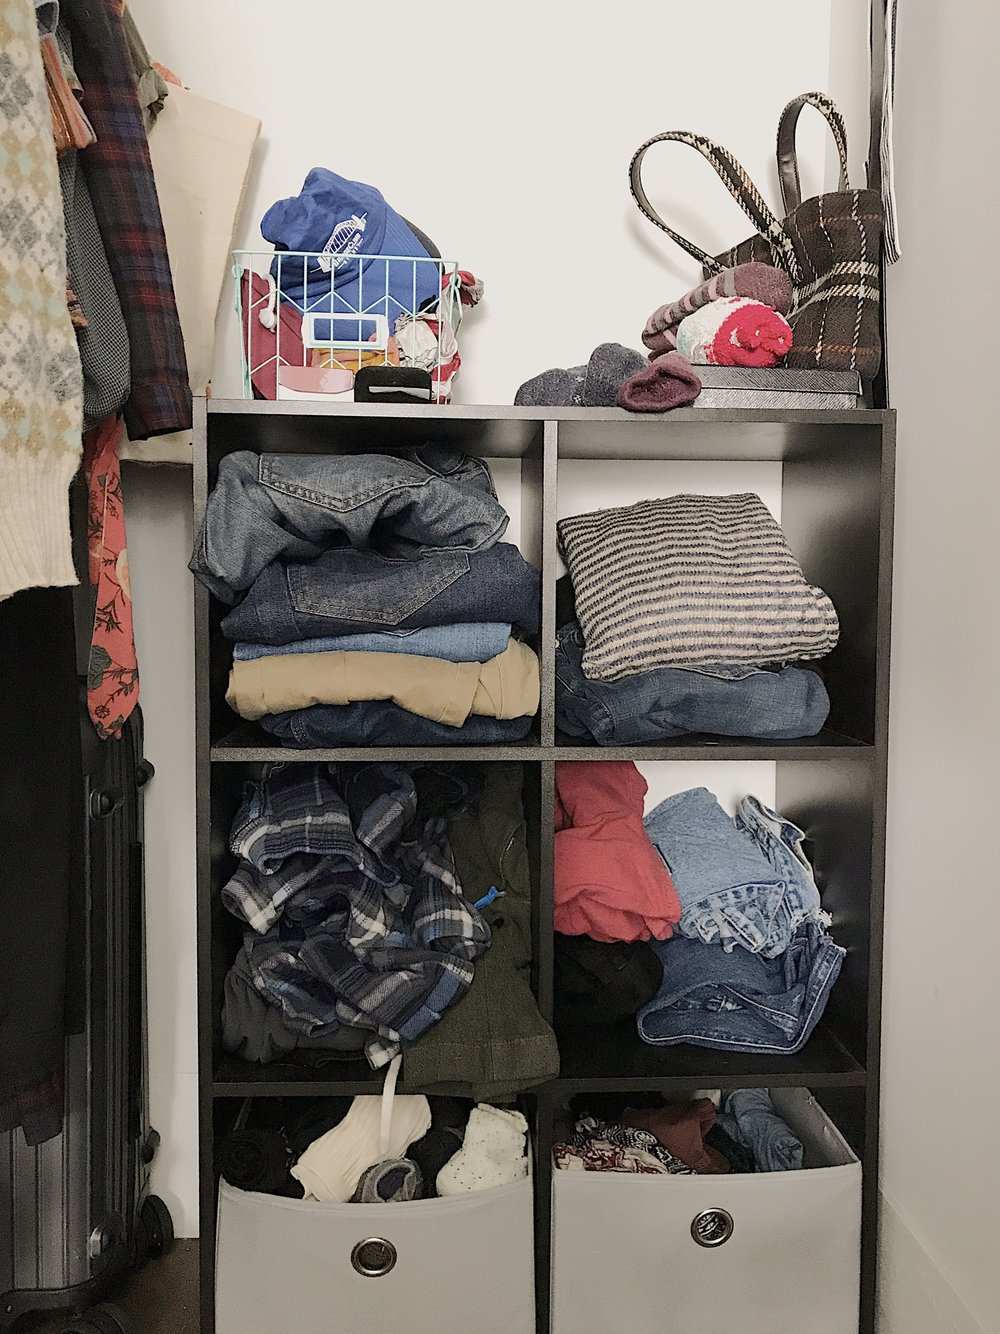 This shelf is still a work in progress